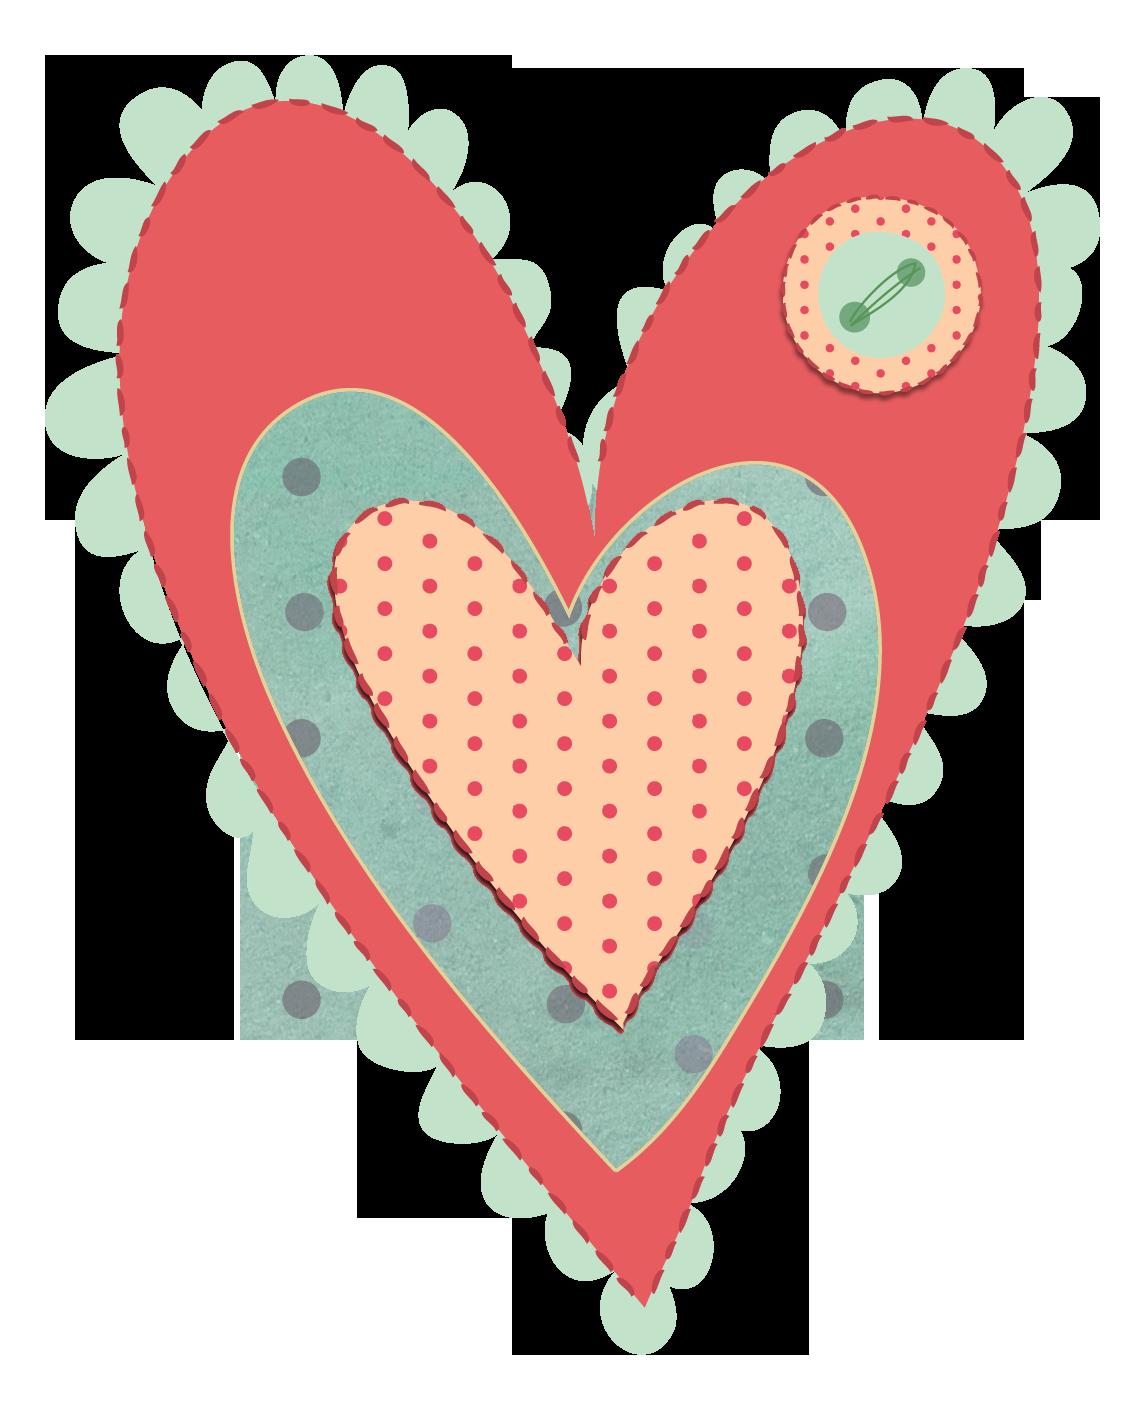 Hearts clipart vintage. Heart clip art net